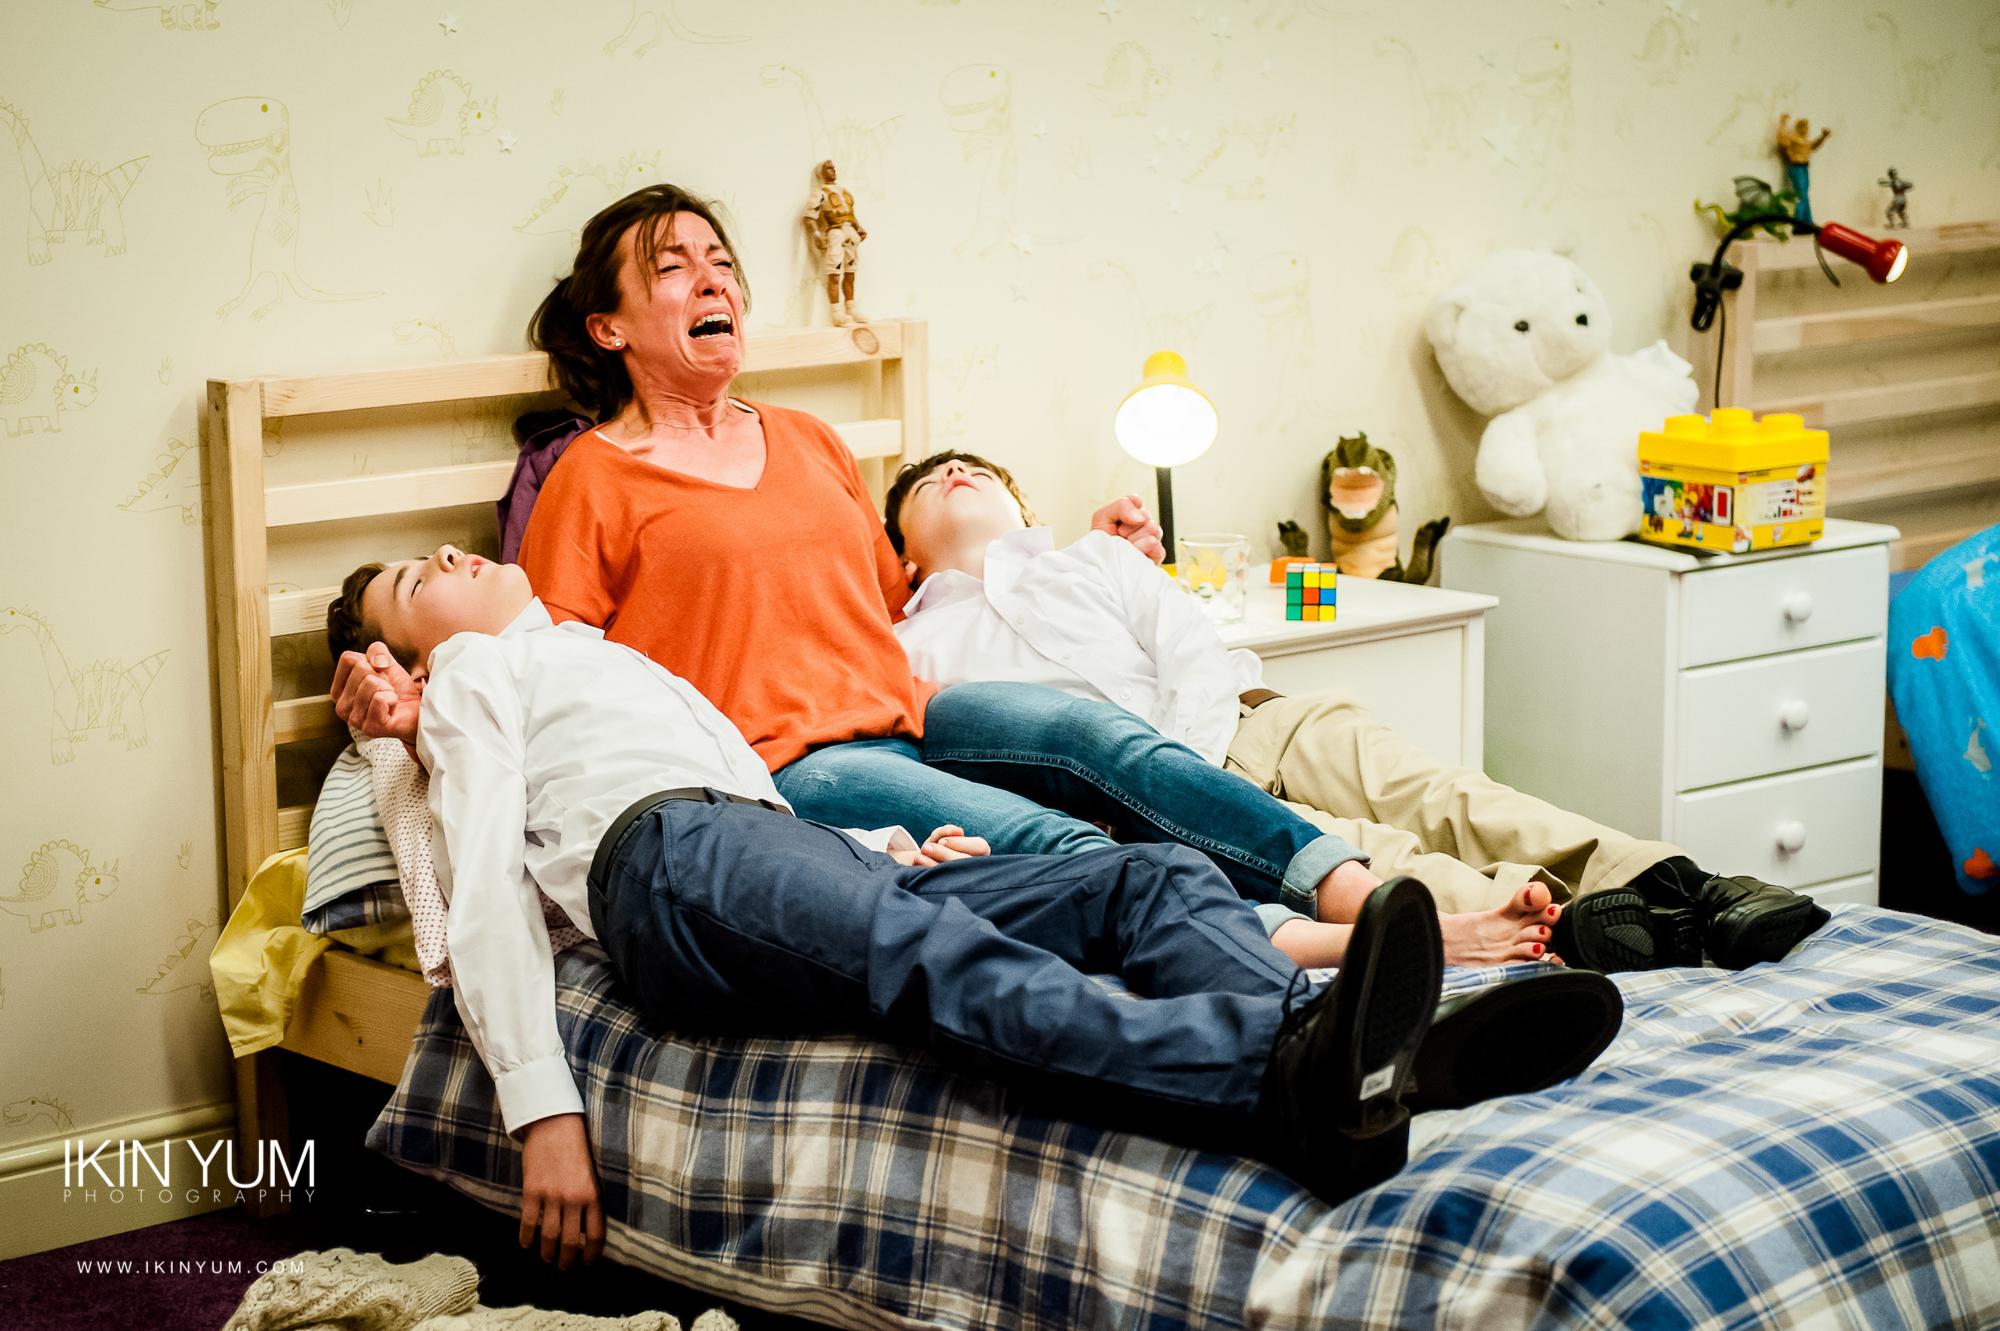 Medea - Gate Theatre blue Cast -Ikin Yum Photography-113.jpg